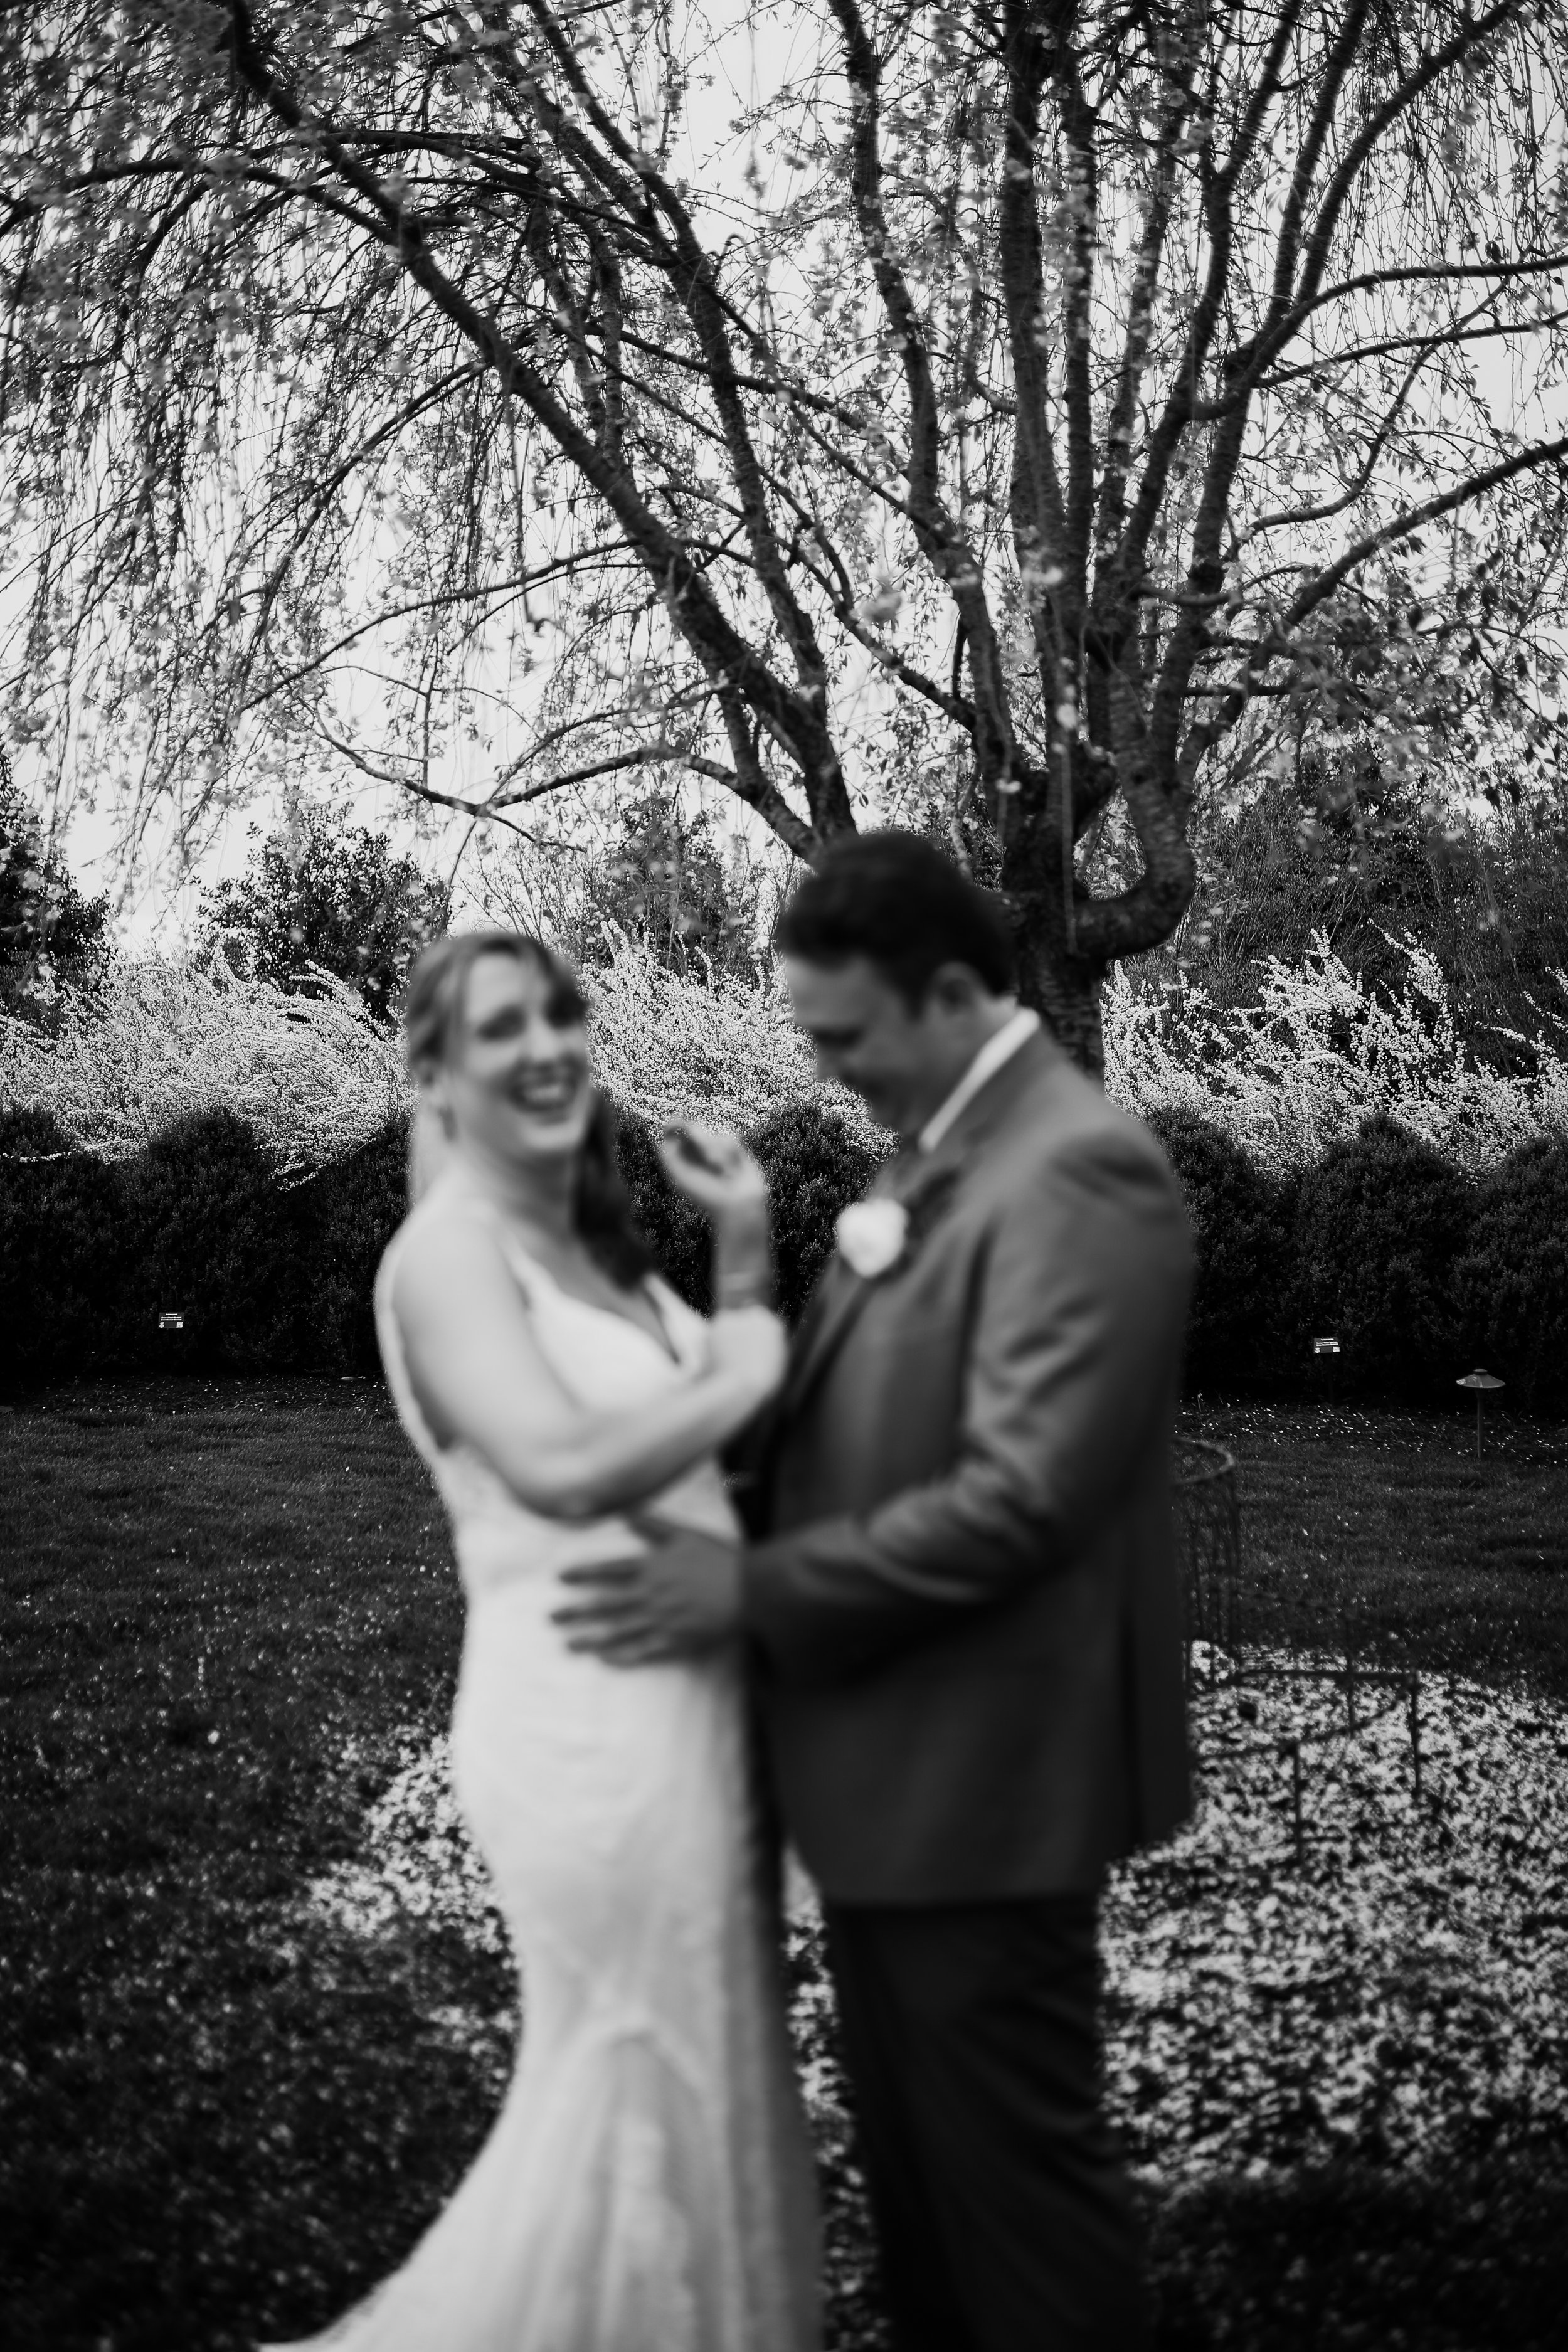 TheGreens_Married_2019-110.jpg